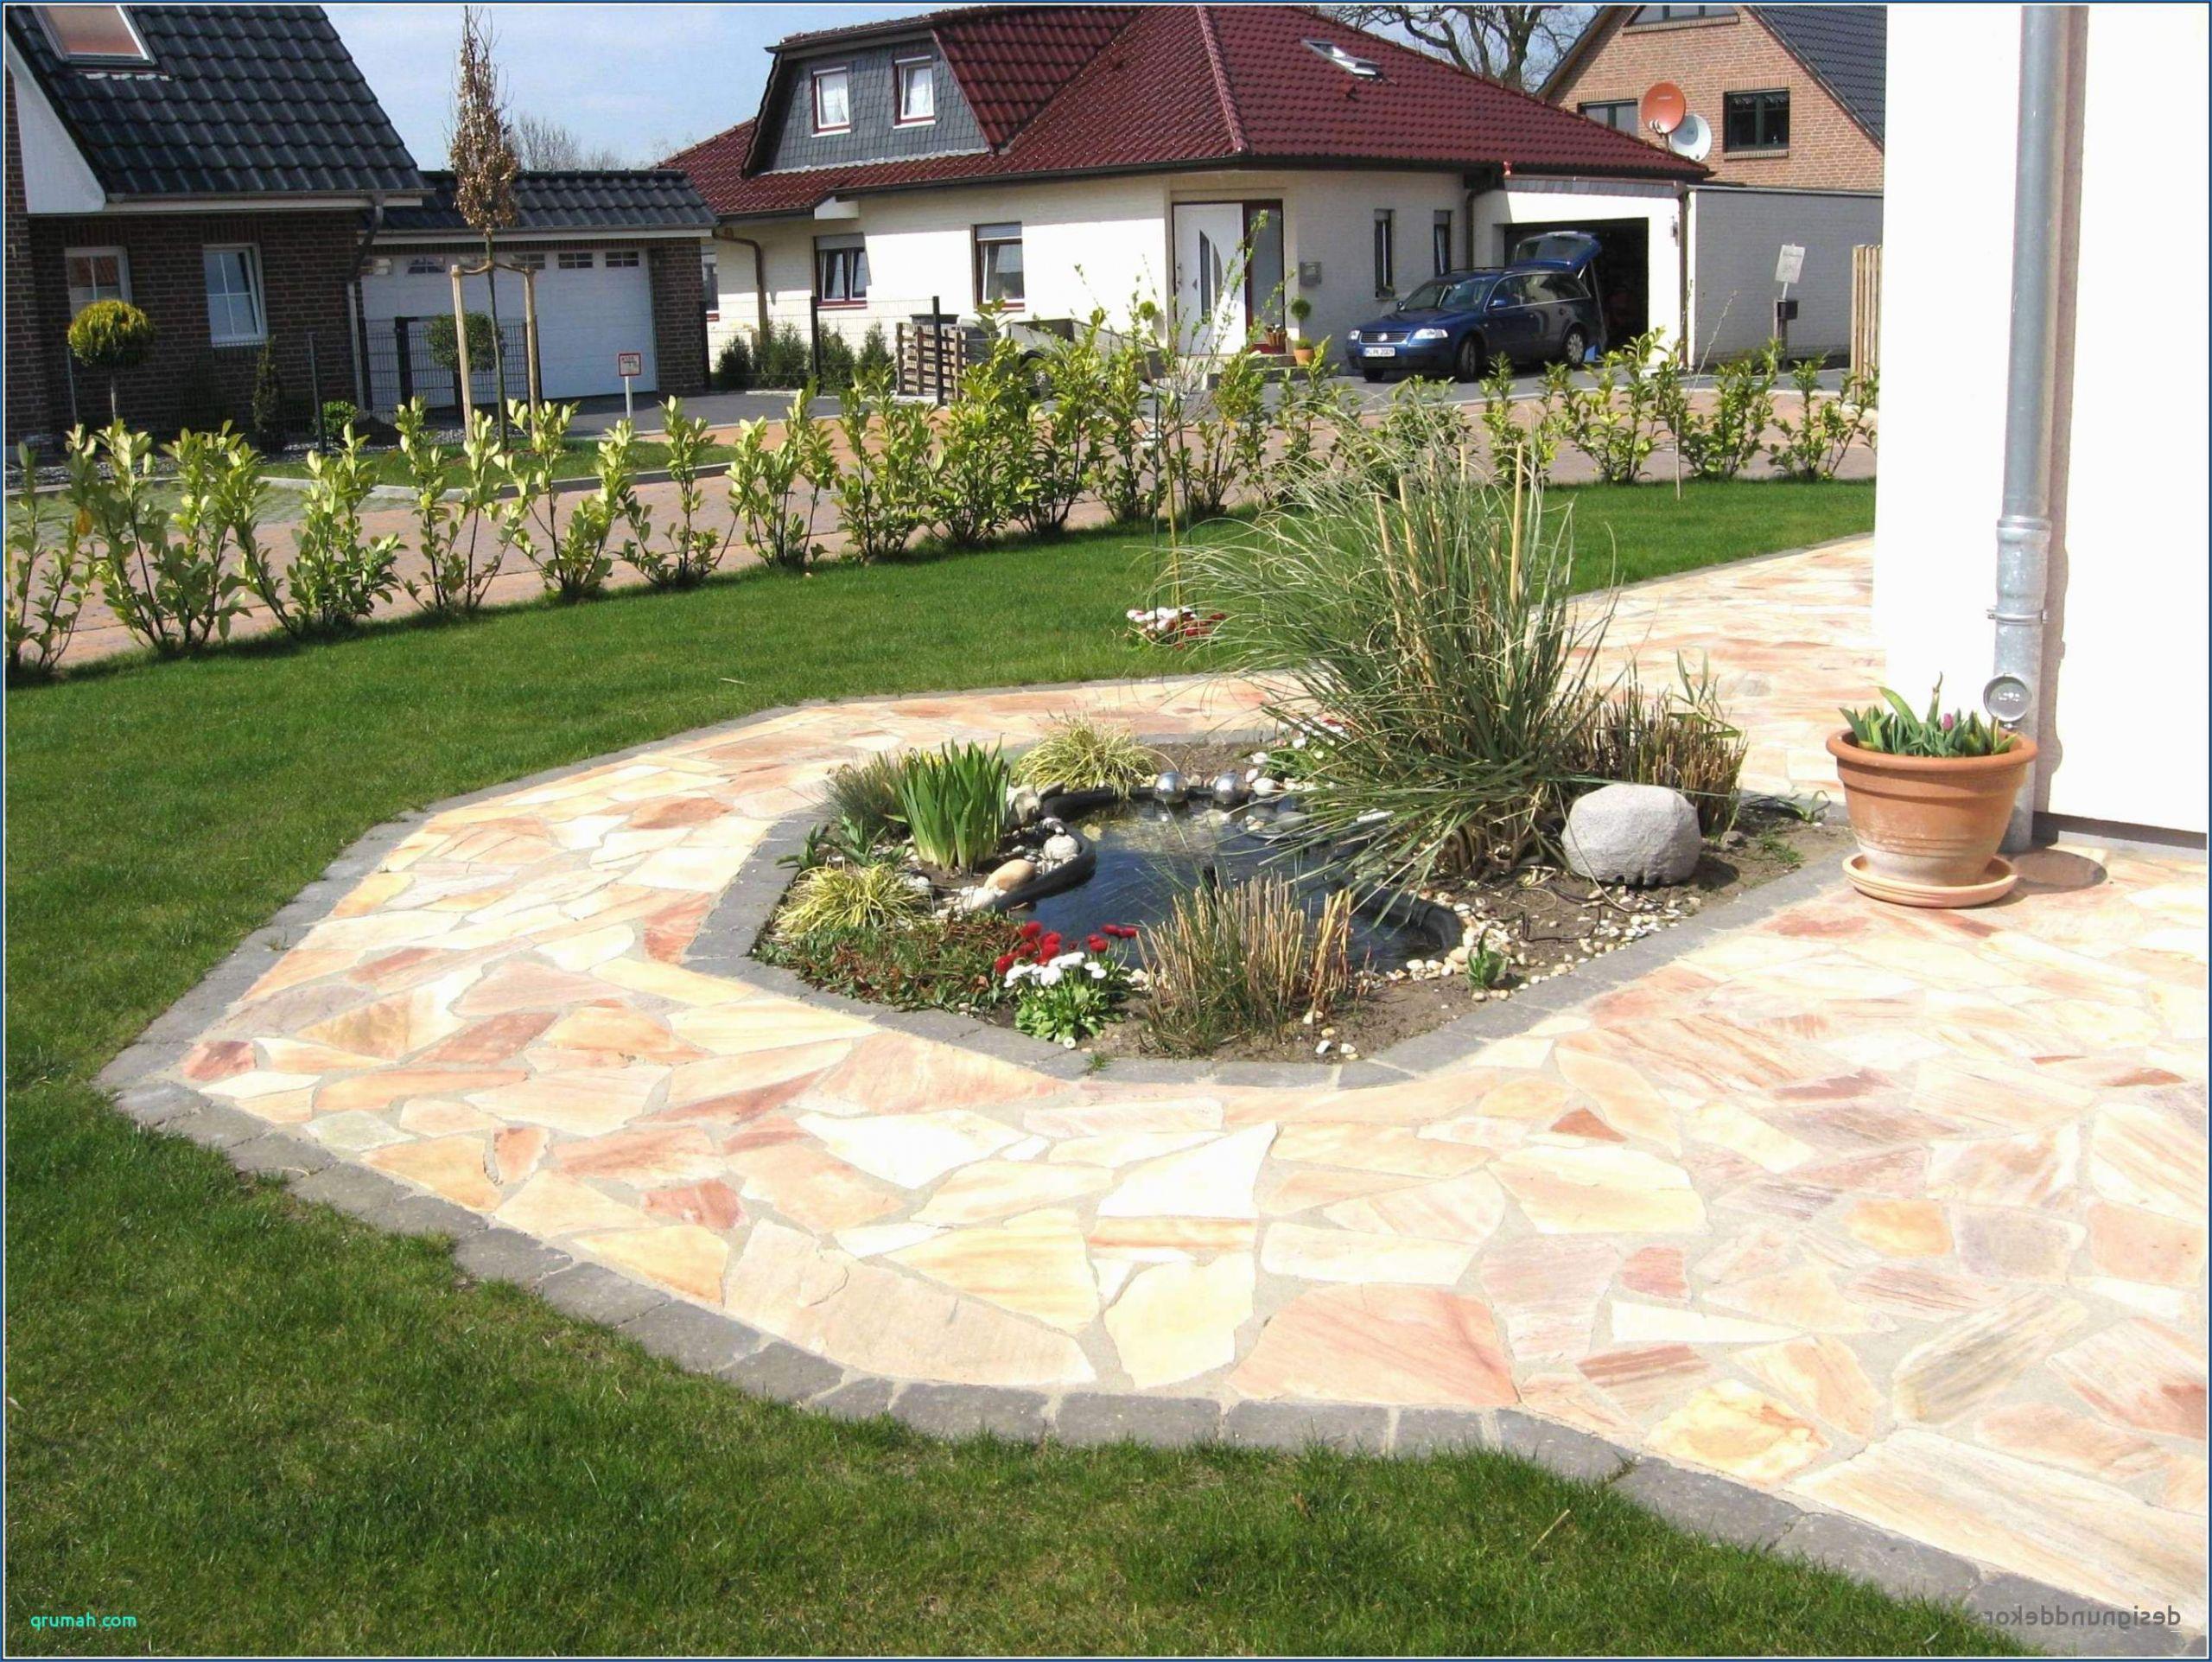 Garten Gestalten Online Frisch Garten Gestalten Ideen — Temobardz Home Blog